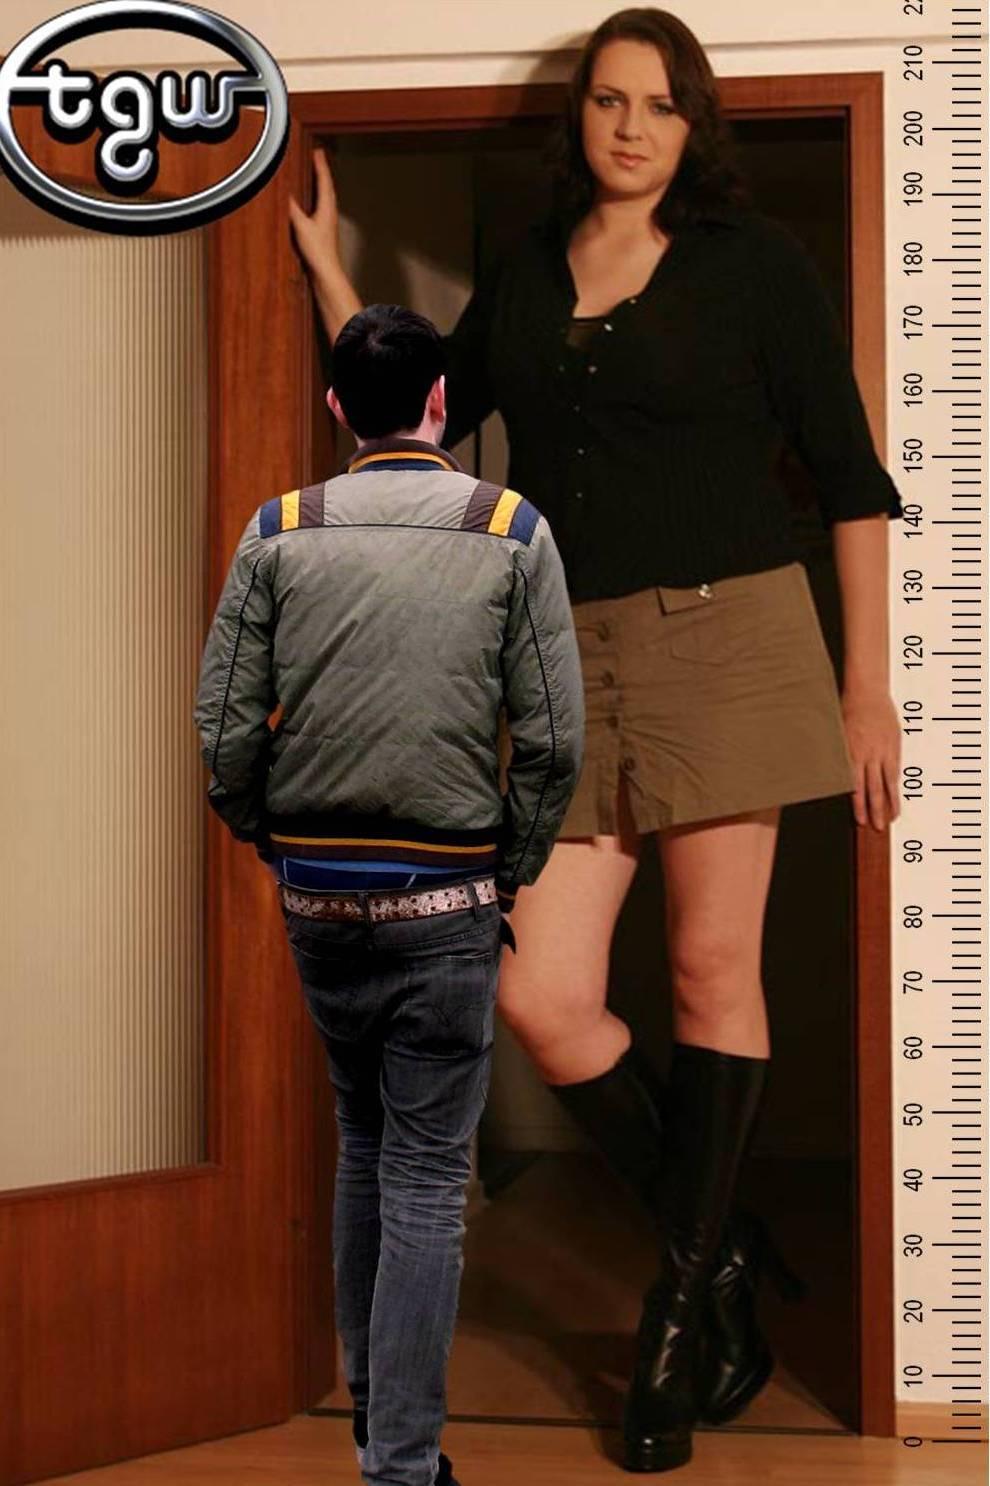 Caroline Welz 206cm+12 6ft9+5in and me by zaratustraelsabio on ...